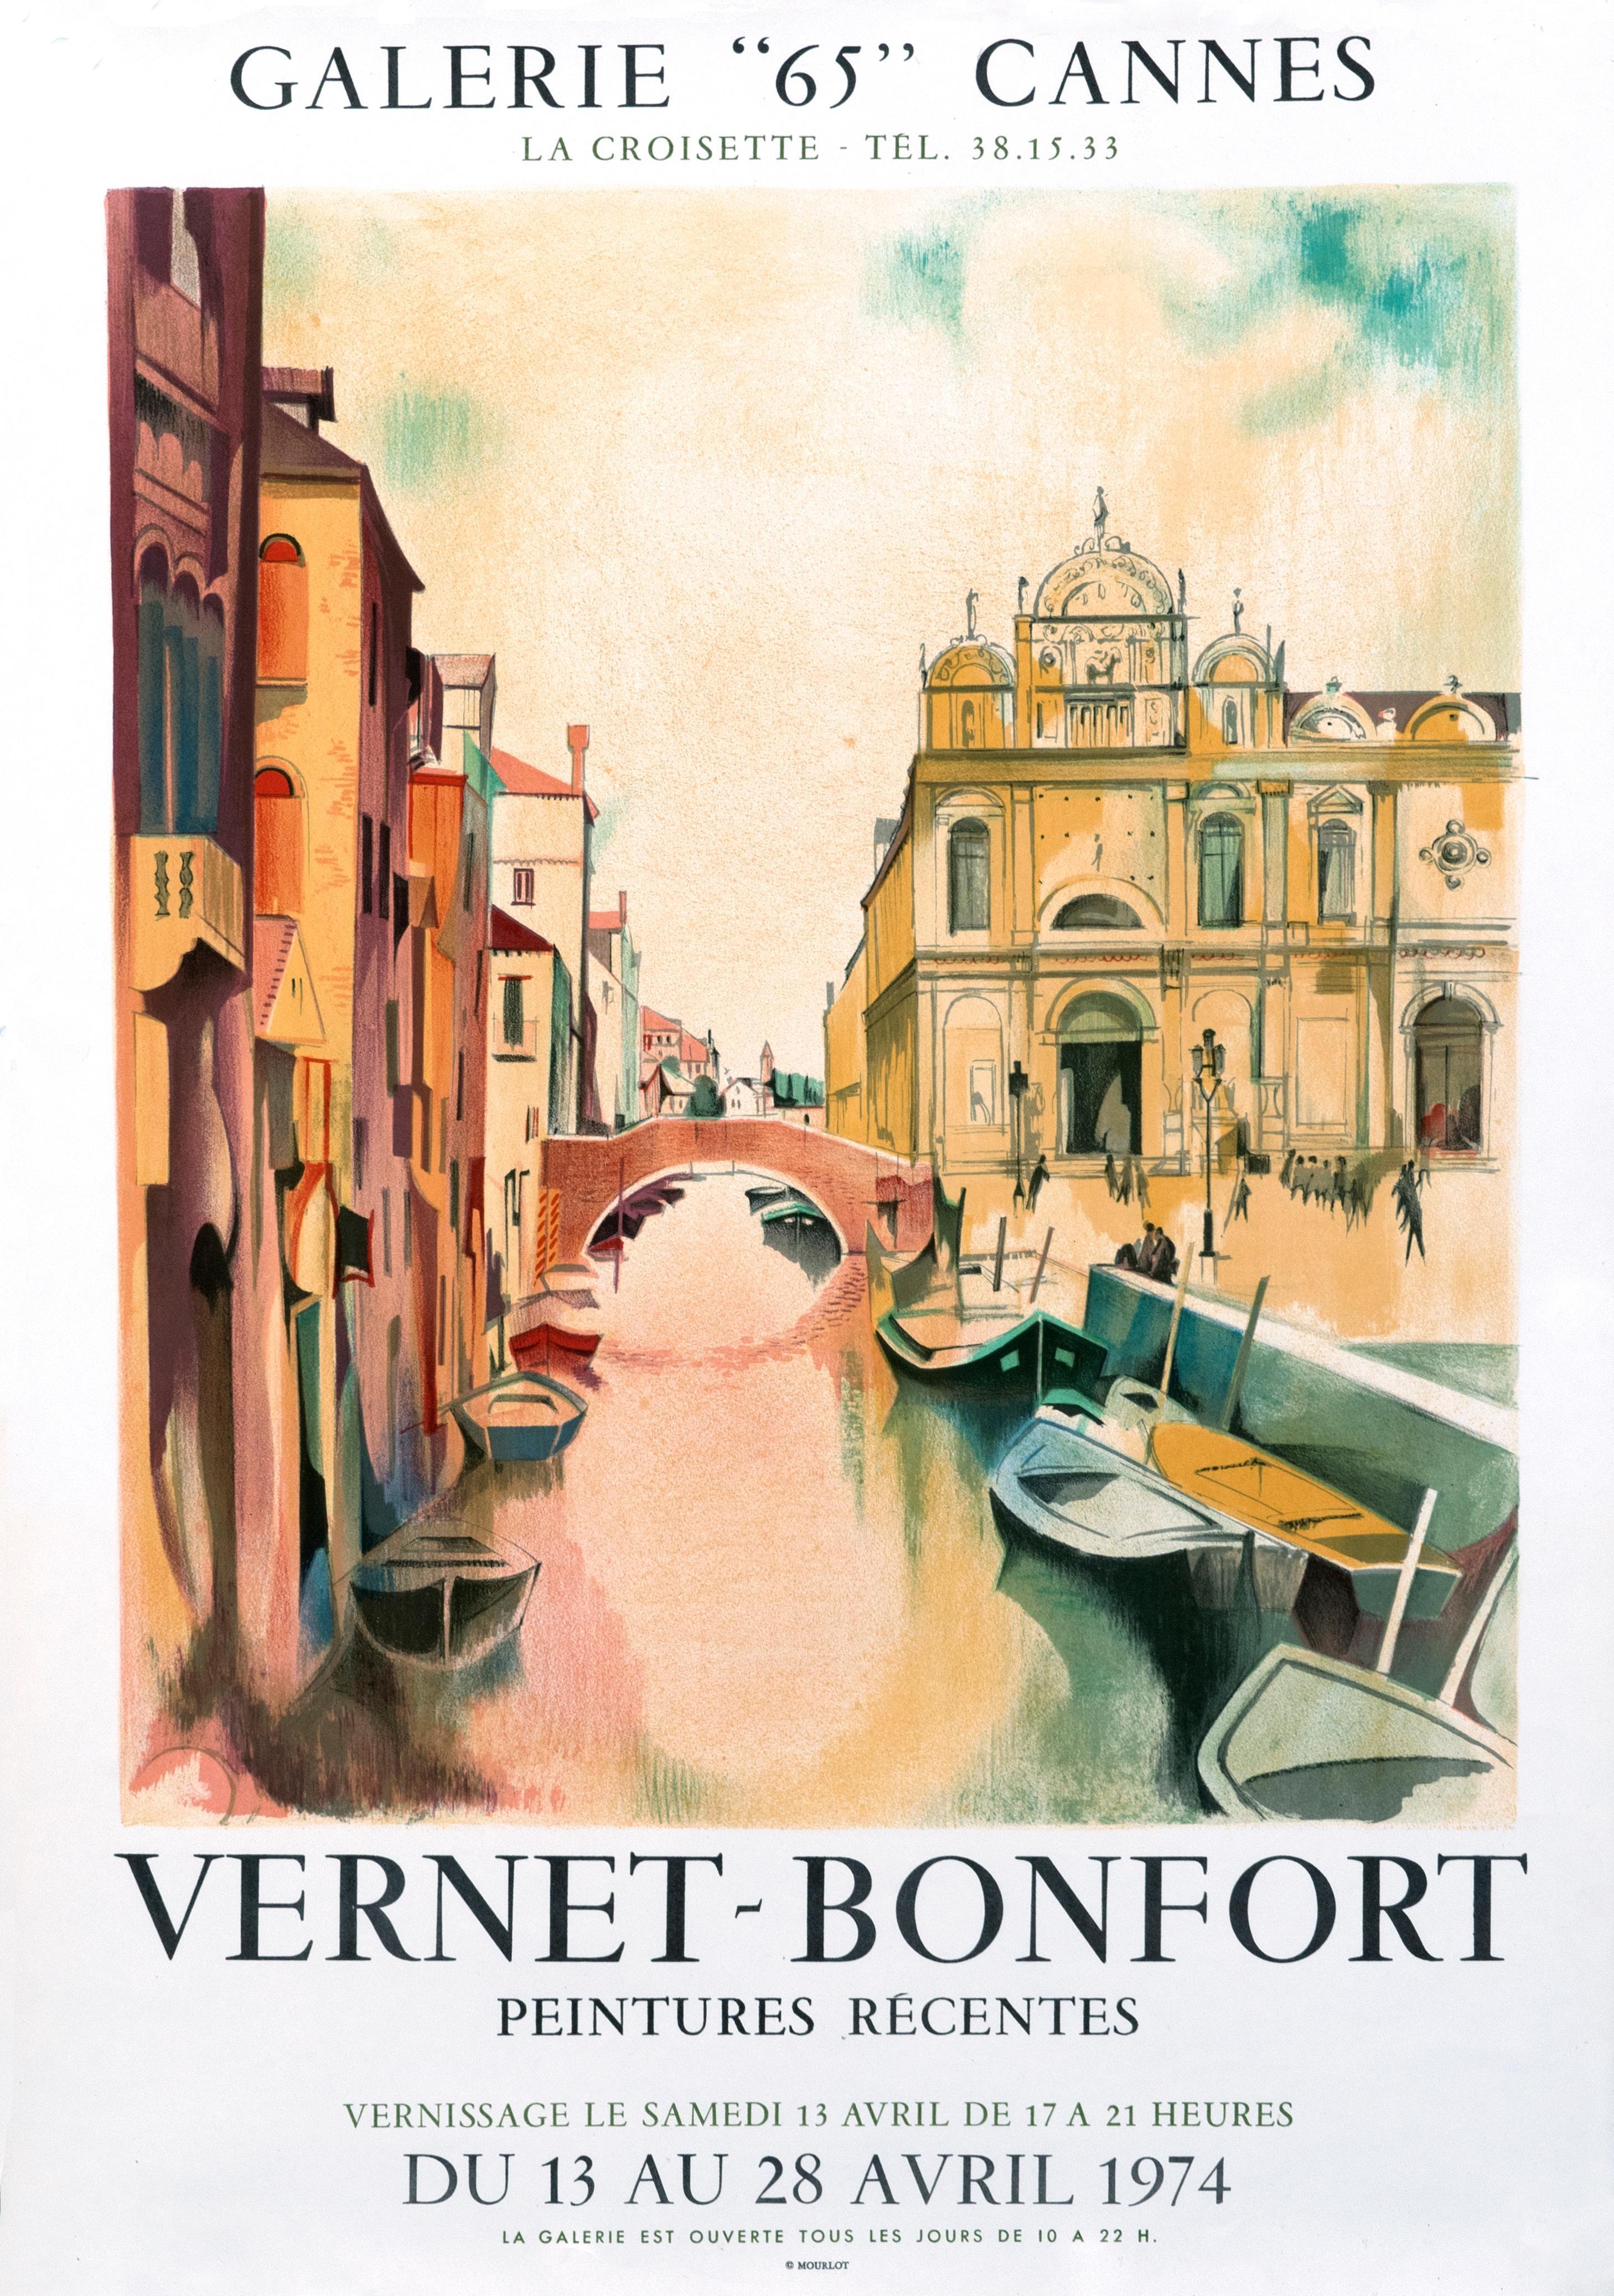 """Vernet-Bonfort - Galerie 65 Cannes"" Original Vintage Exhibition Venice Poster"